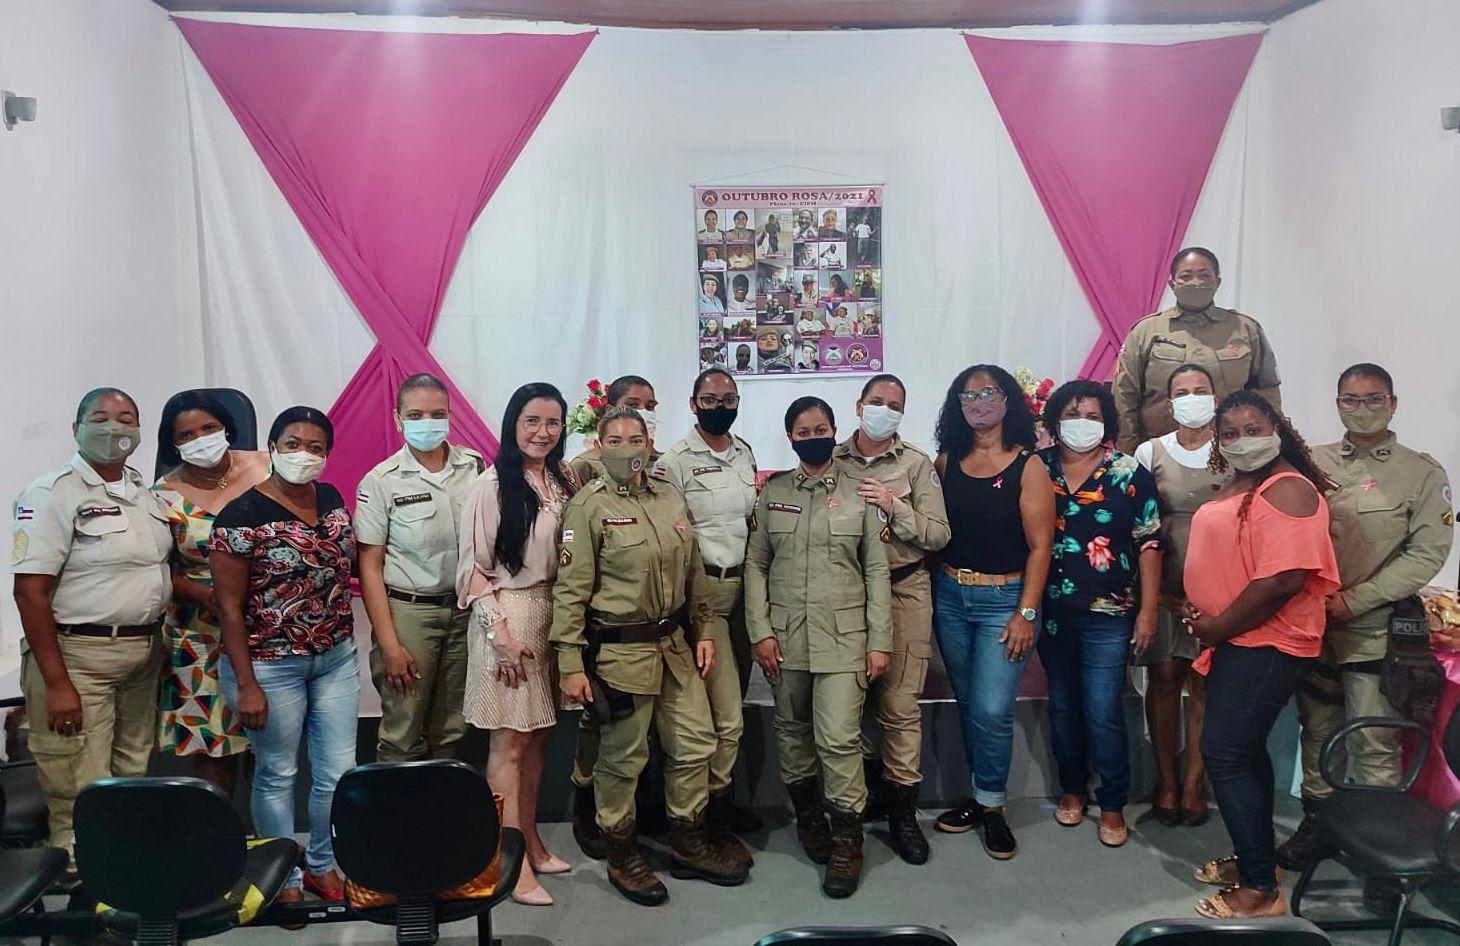 70ª CIPM realiza palestra da campanha Outubro Rosa